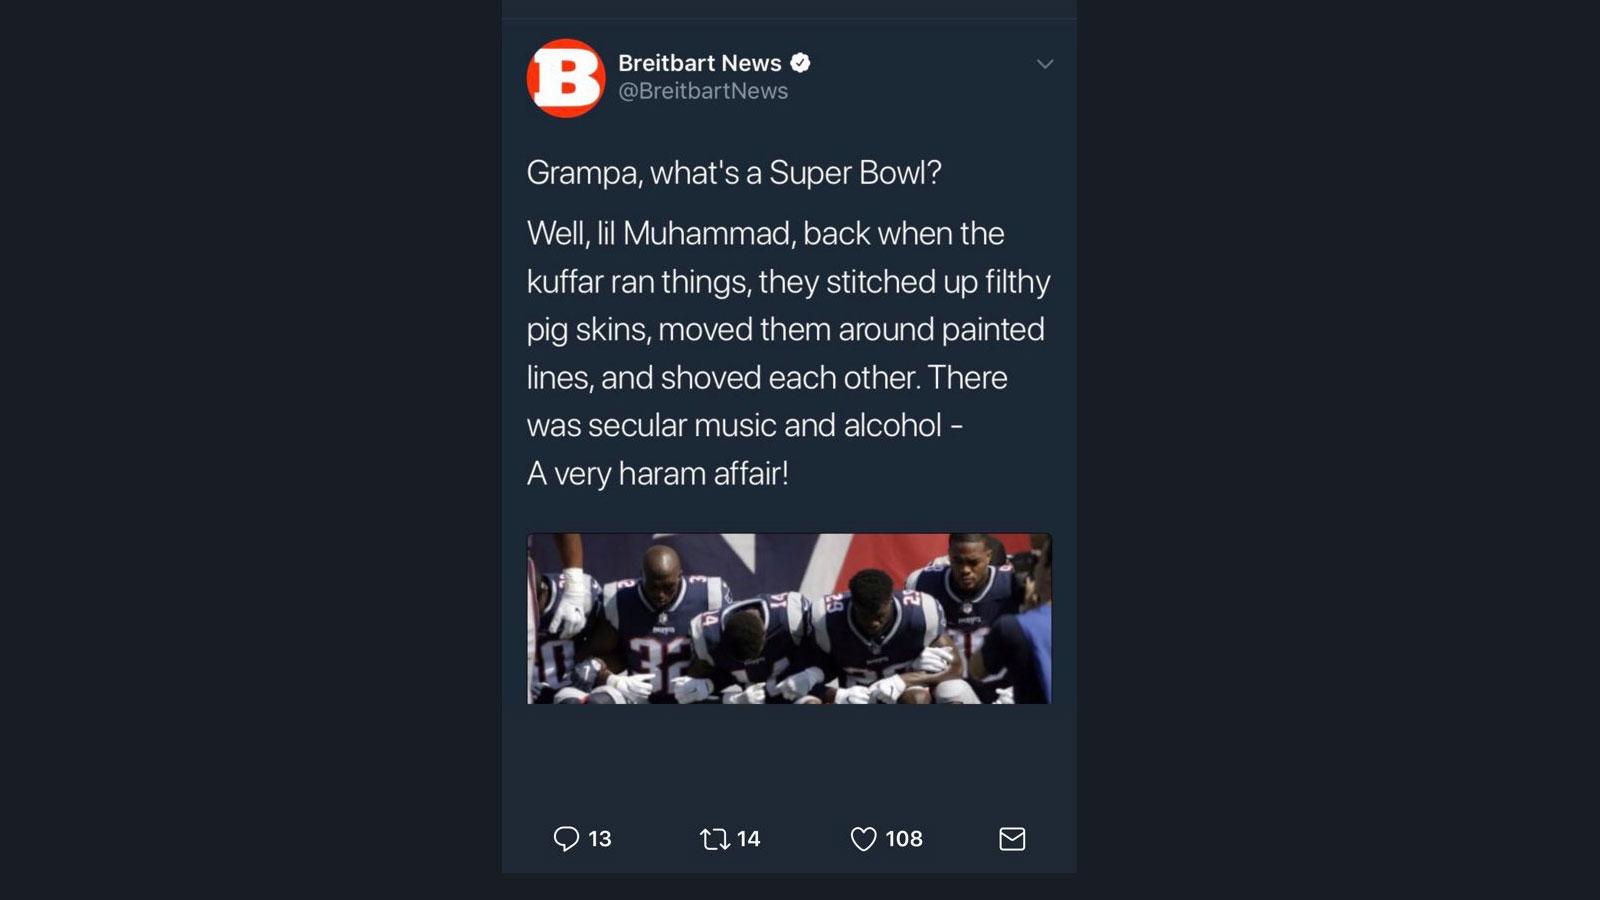 Breitbart deletes a tweet / Boing Boing